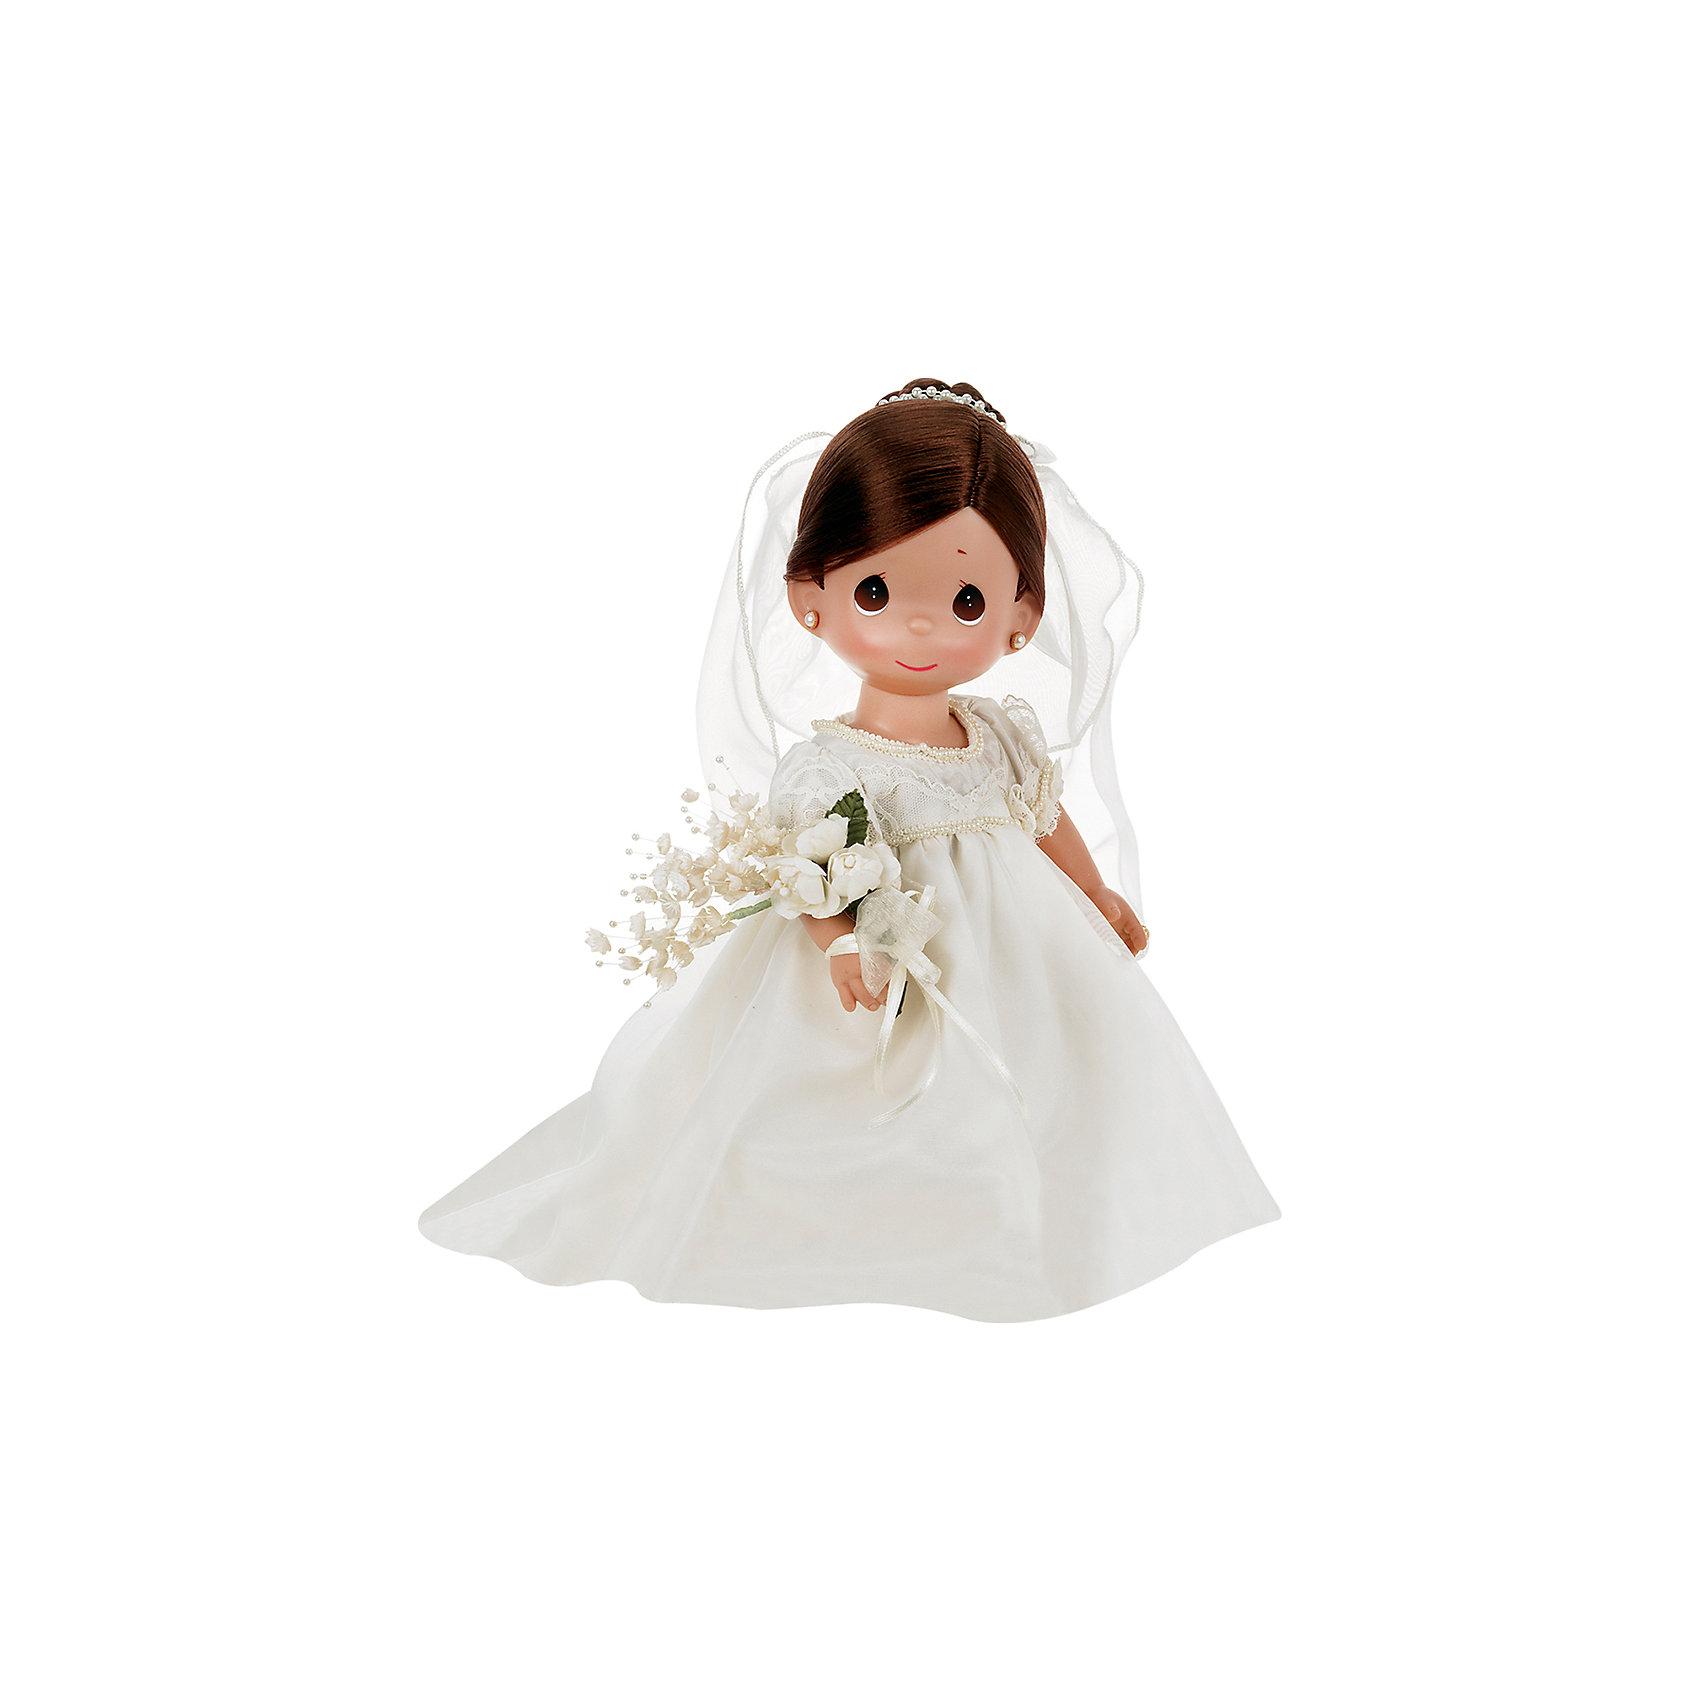 Кукла Зачарованные сны. Невеста, брюнетка, 30 см, Precious MomentsБренды кукол<br><br><br>Ширина мм: 140<br>Глубина мм: 300<br>Высота мм: 80<br>Вес г: 428<br>Возраст от месяцев: 36<br>Возраст до месяцев: 2147483647<br>Пол: Женский<br>Возраст: Детский<br>SKU: 5482502